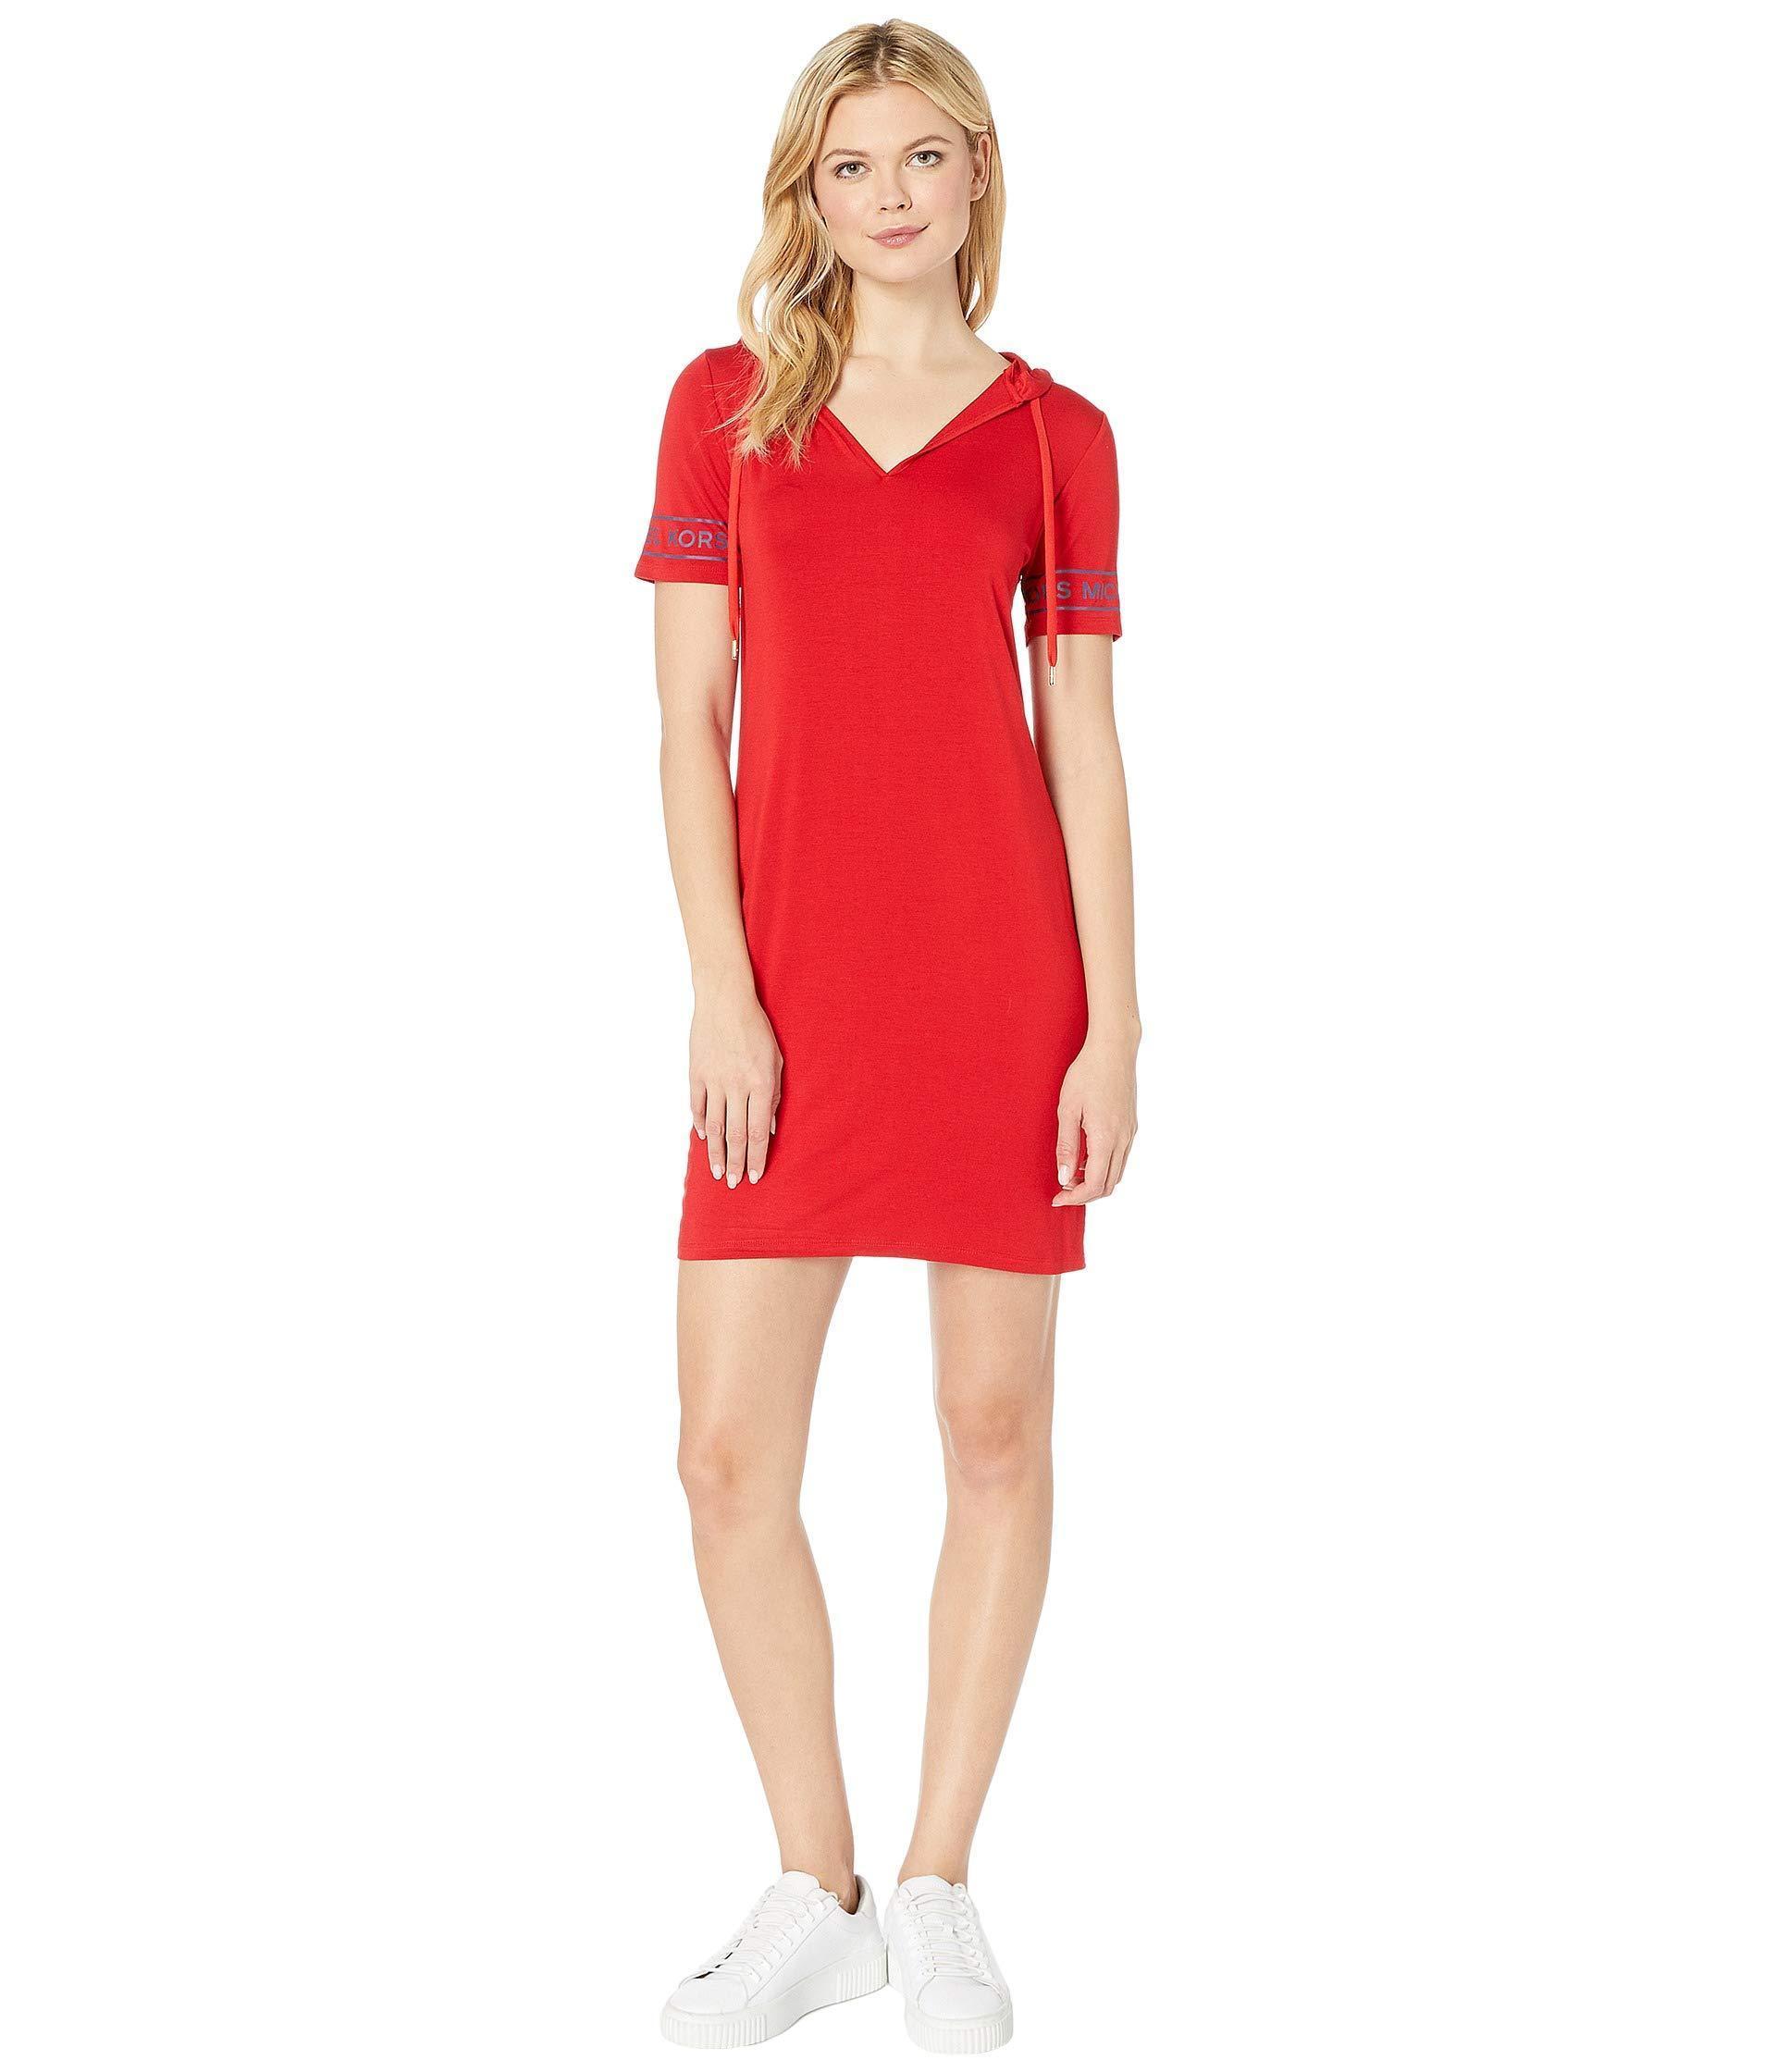 d51878d8637 Lyst - MICHAEL Michael Kors Logo Sleeve Hoodie Dress (scarlet ...